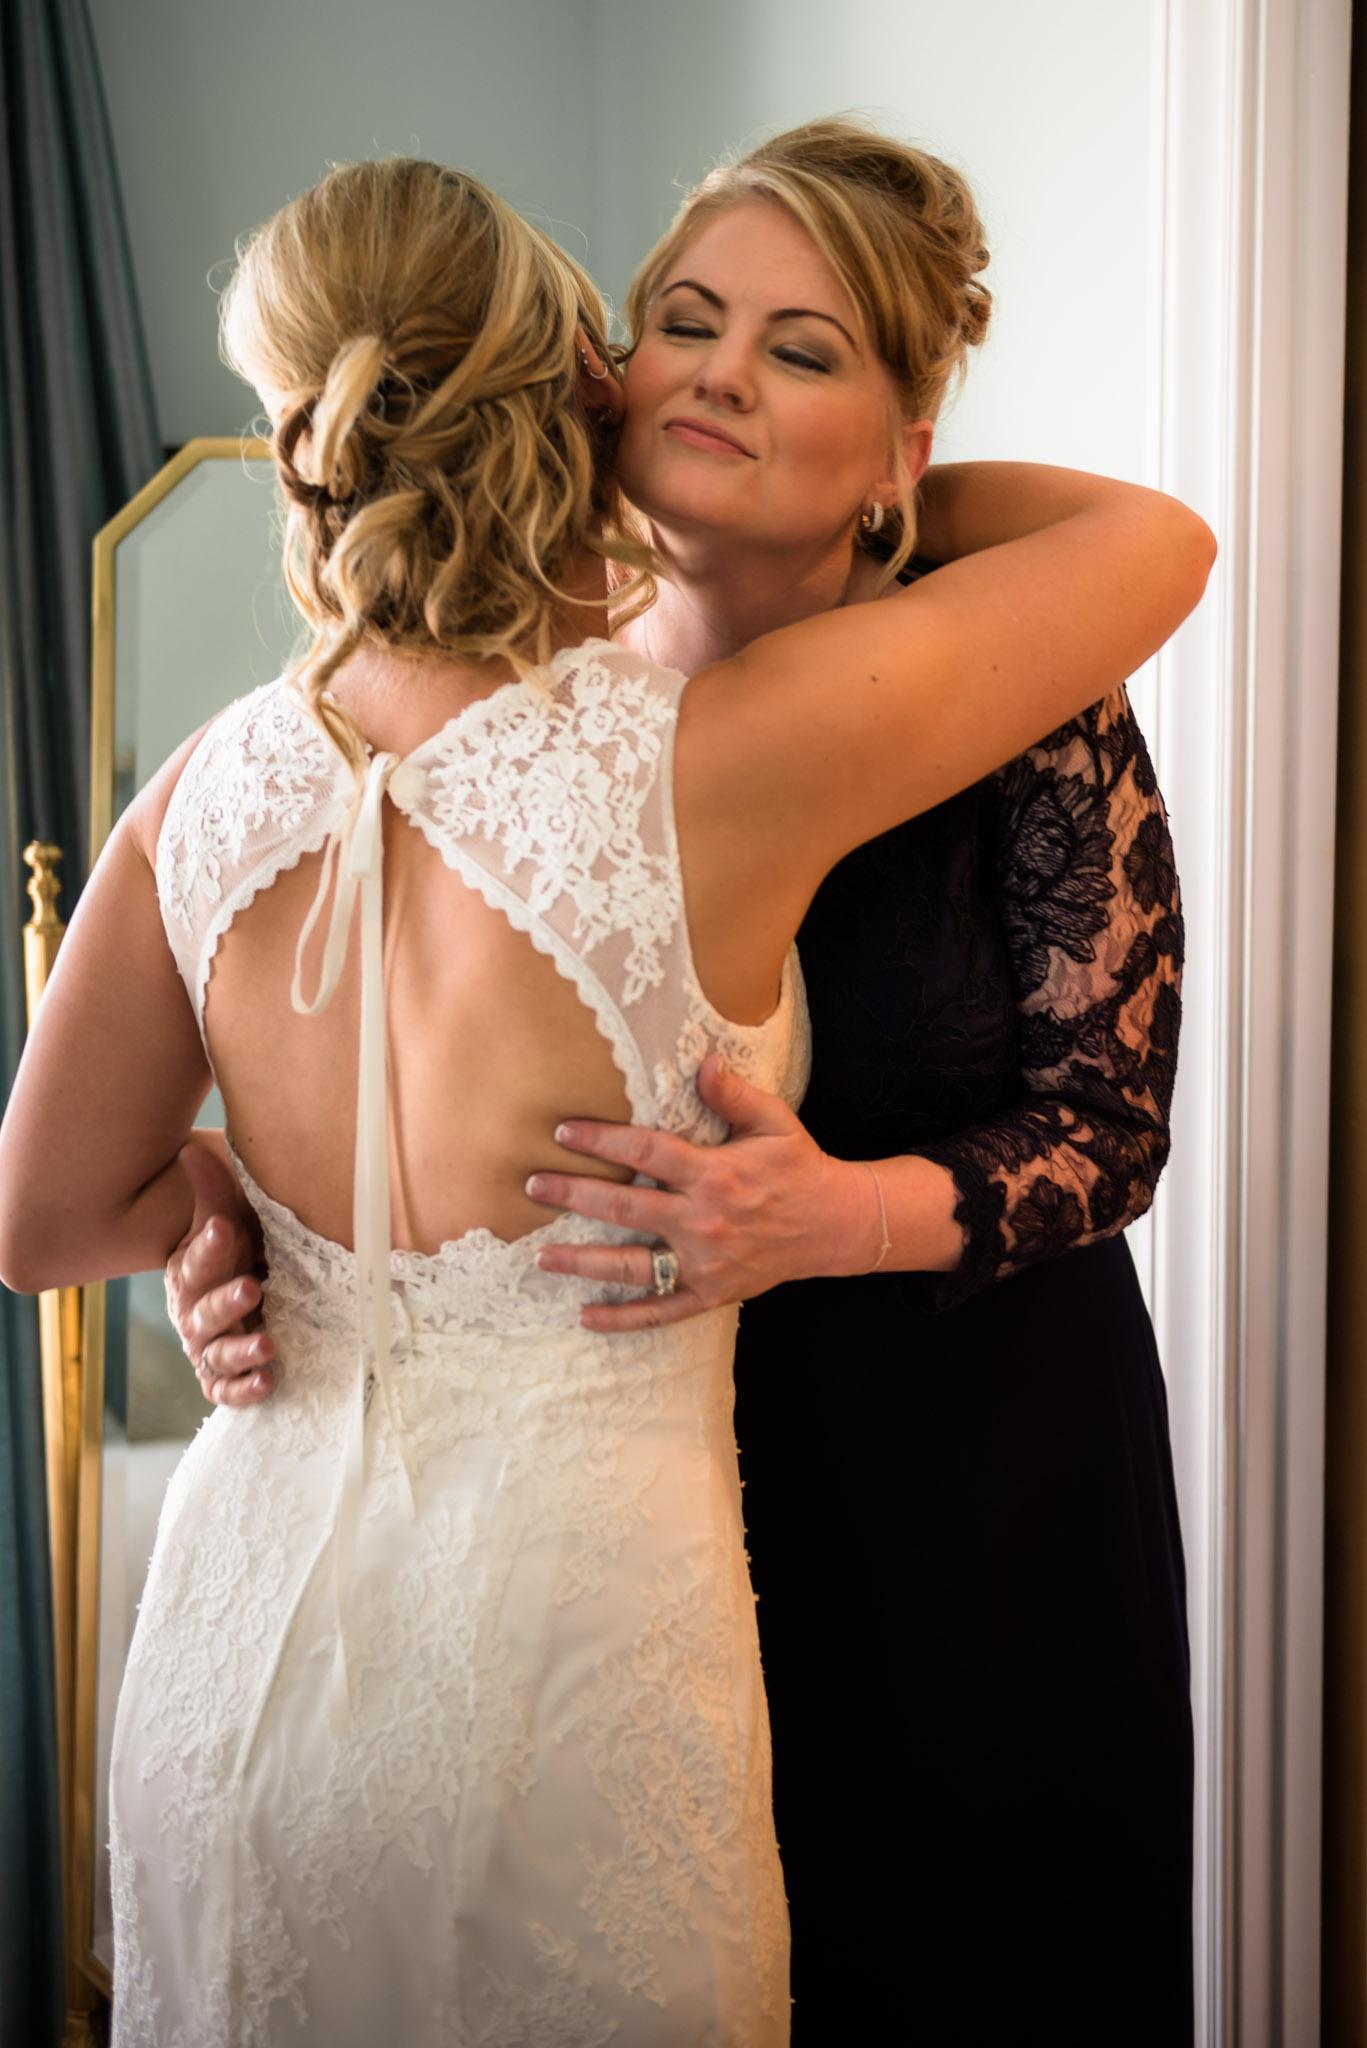 Avensole-Winery-Temecula-Wedding-Josh-and-Olivia-3080.JPG